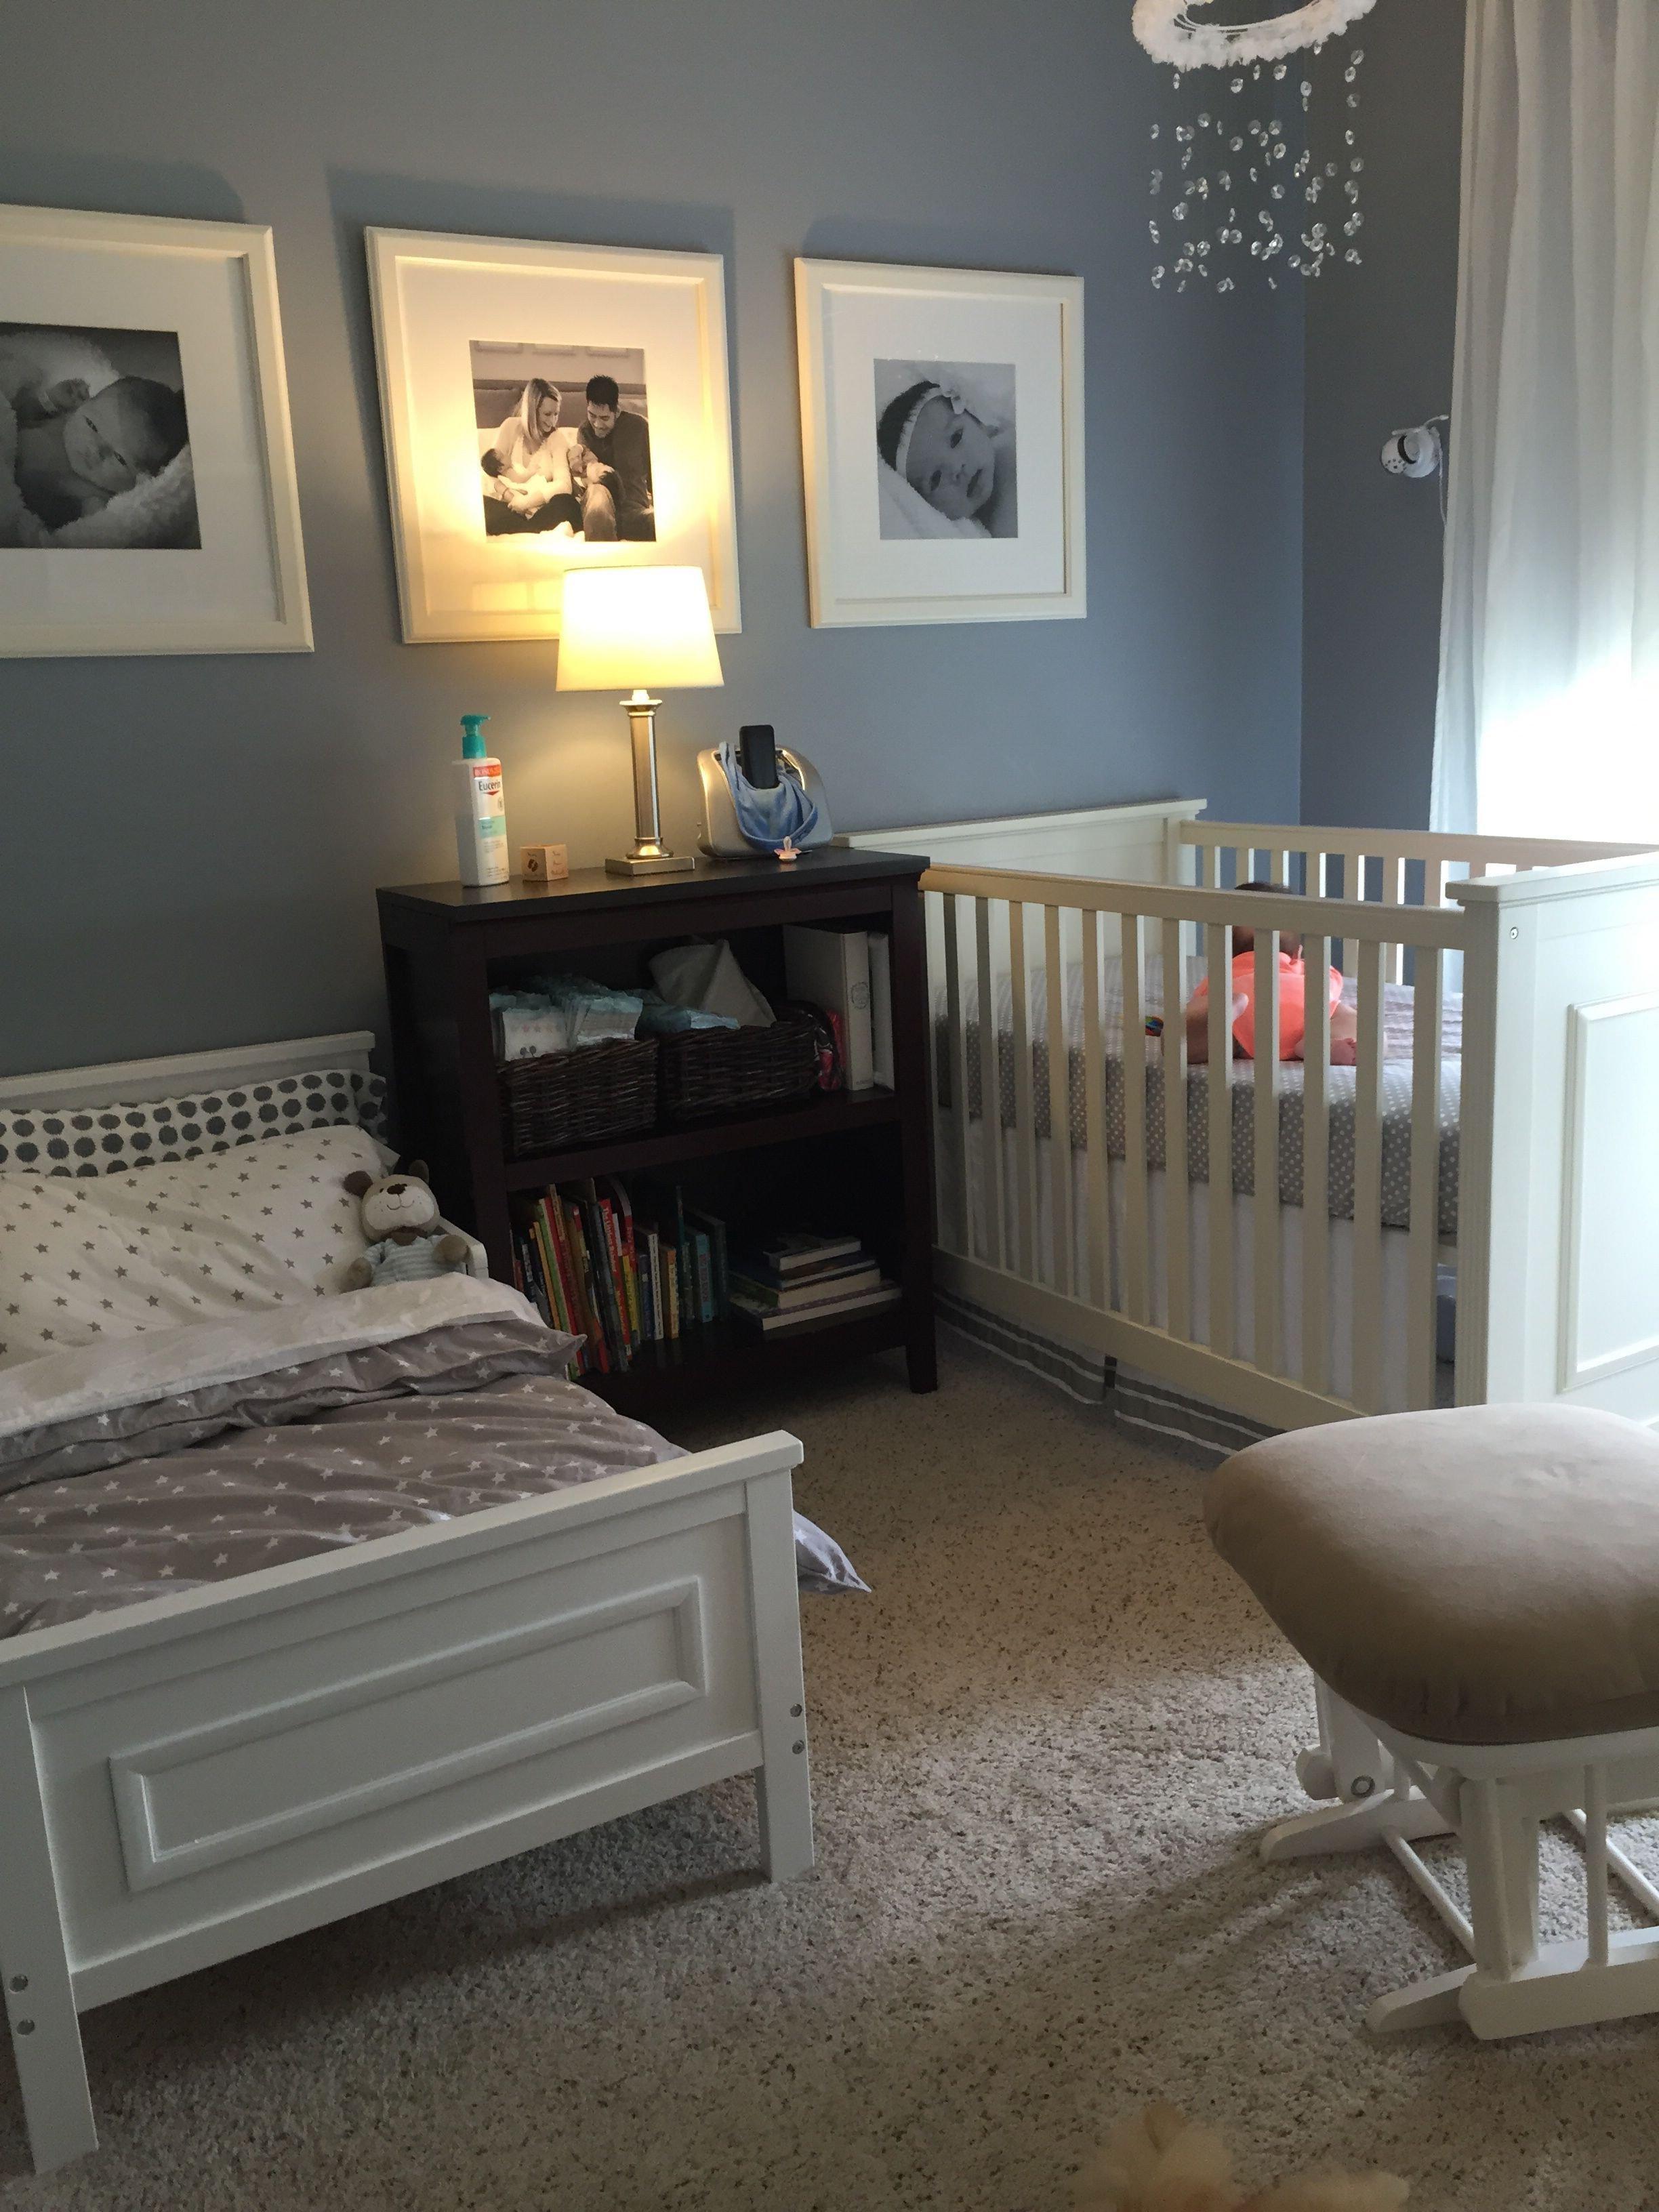 Toddler Boys Room Decor Ideas Elegant Neutral Room for toddler Boy and Baby Girl Boy and Girl D Bedroom Ideas